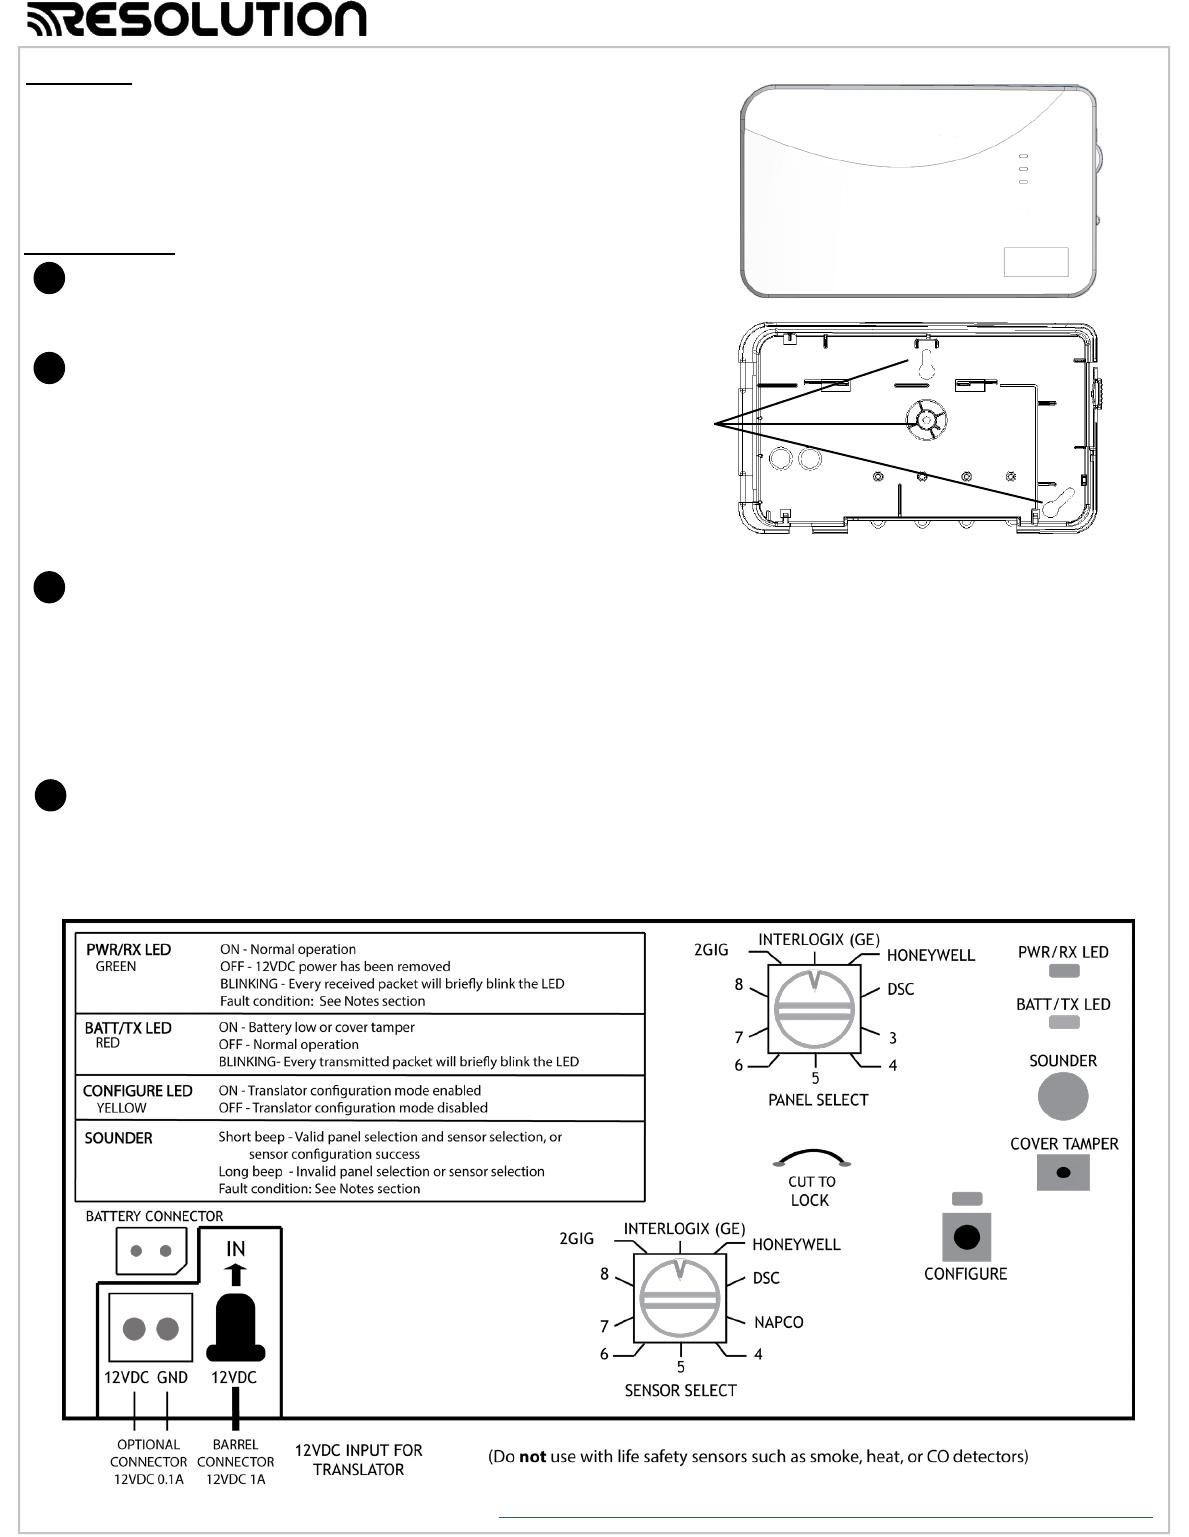 Resolution RE524X RE524X - Wireless to Wireless Translator User Manual